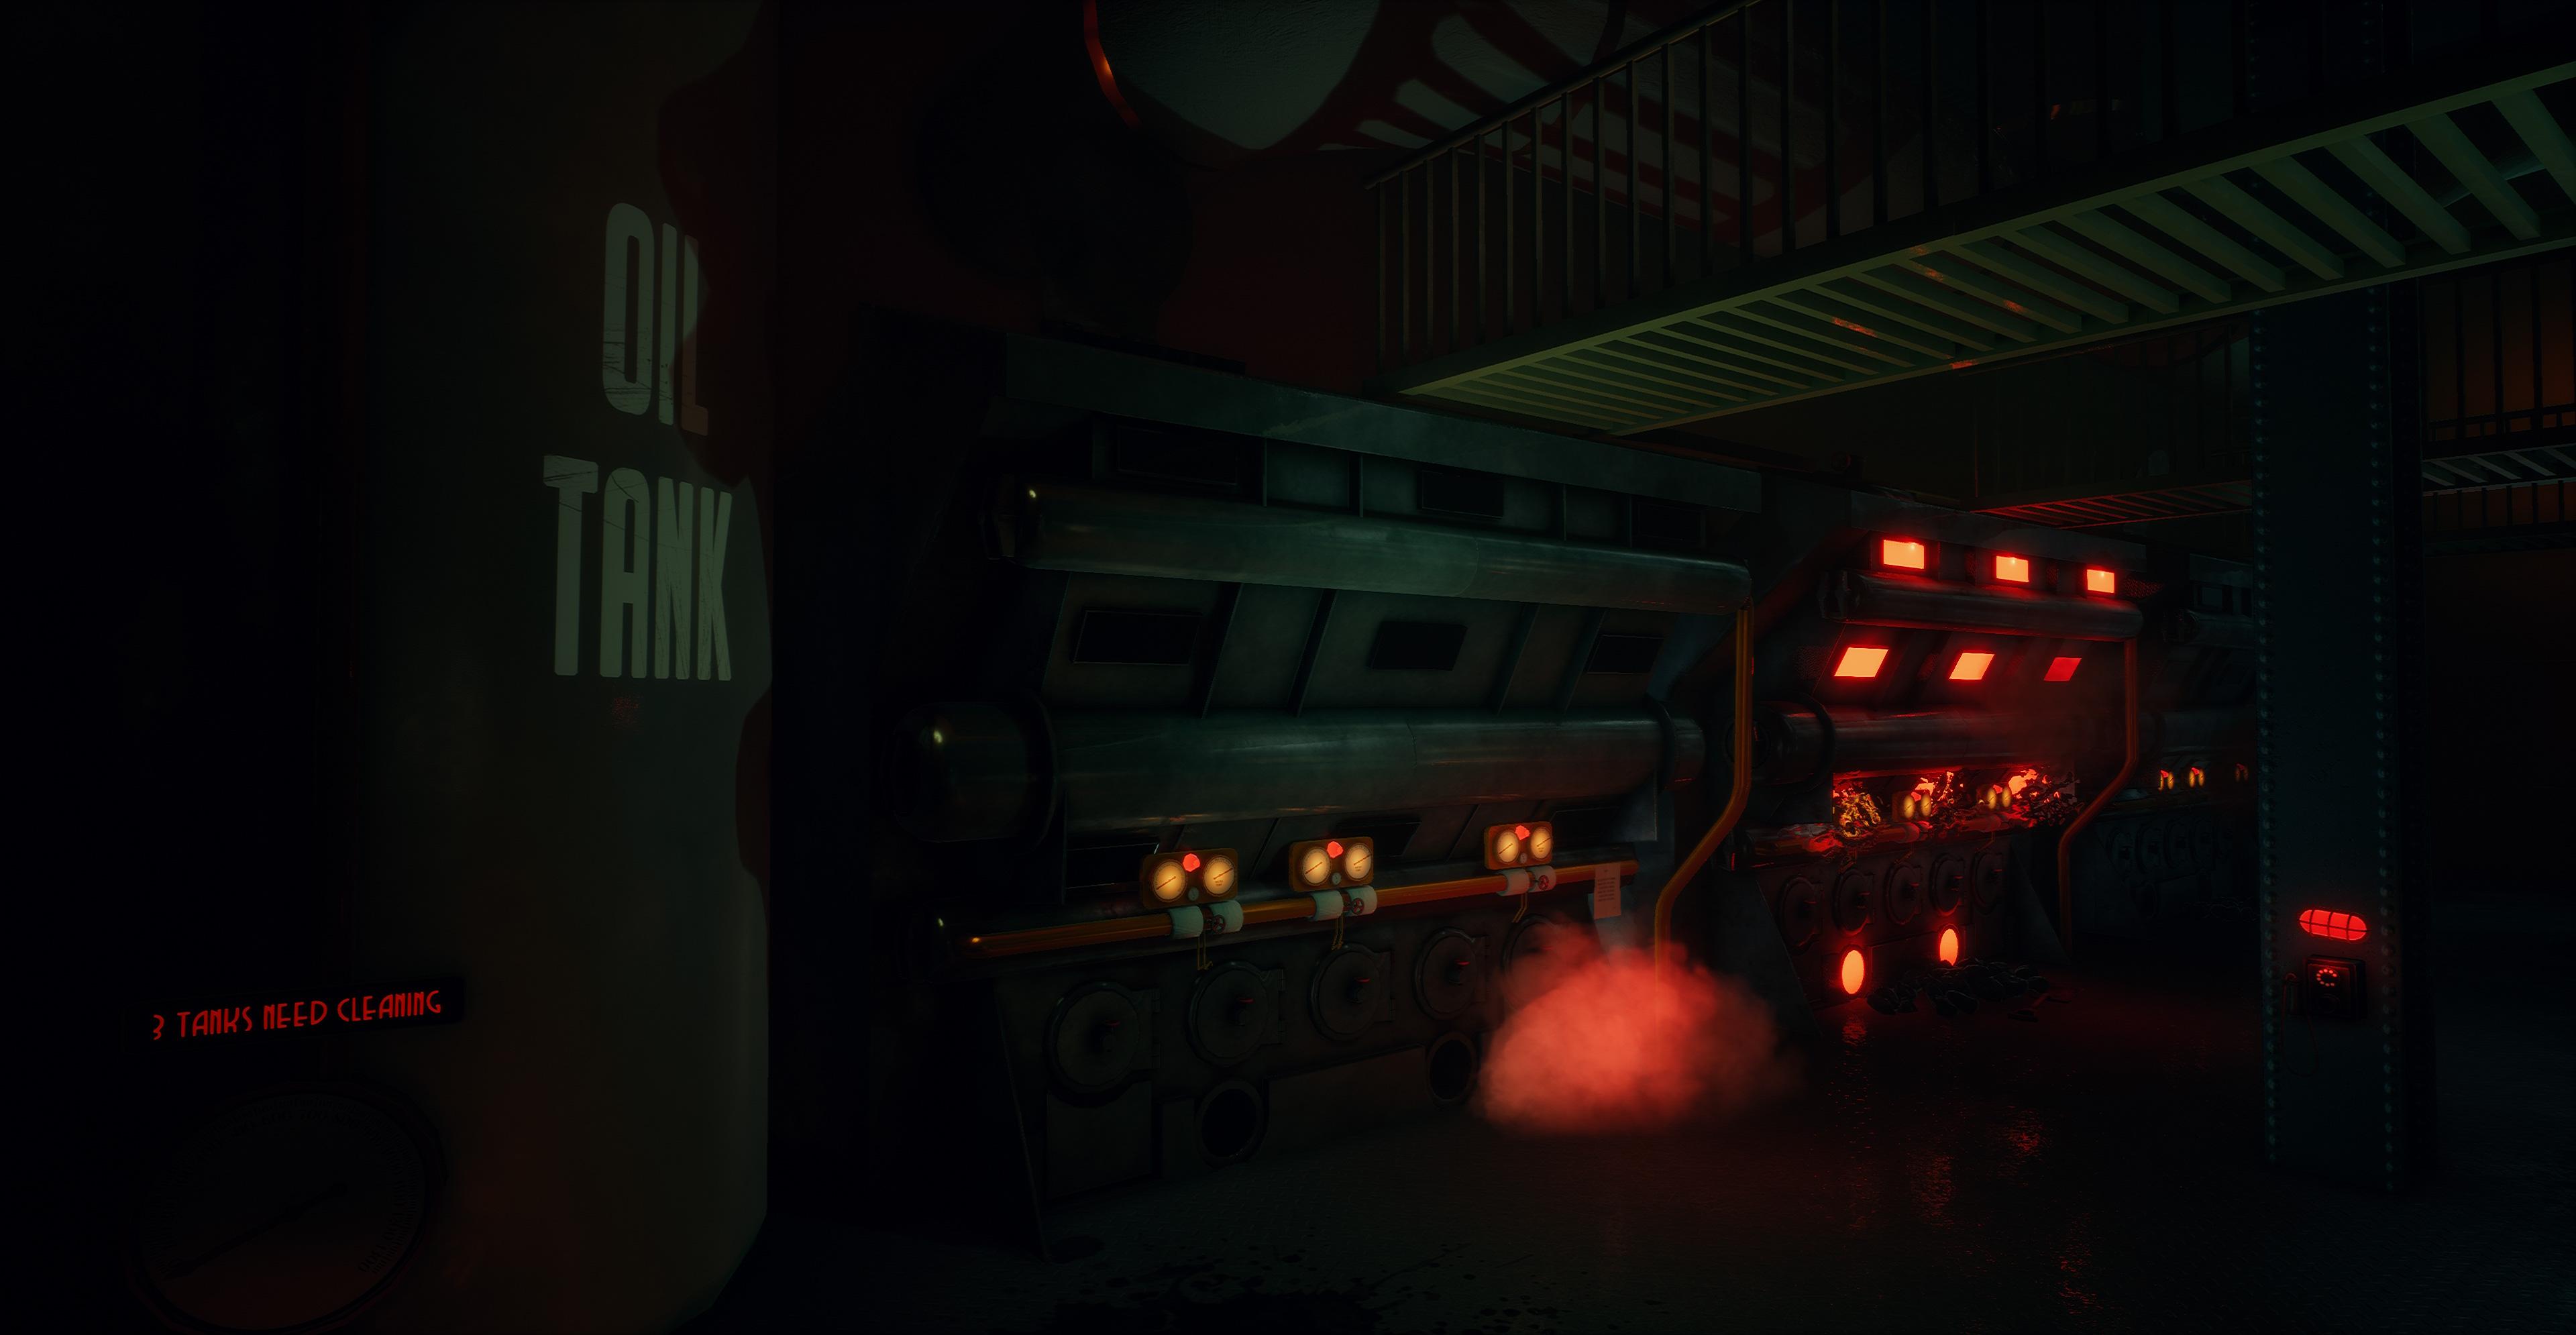 TechnoTsunami Boiler Room 5